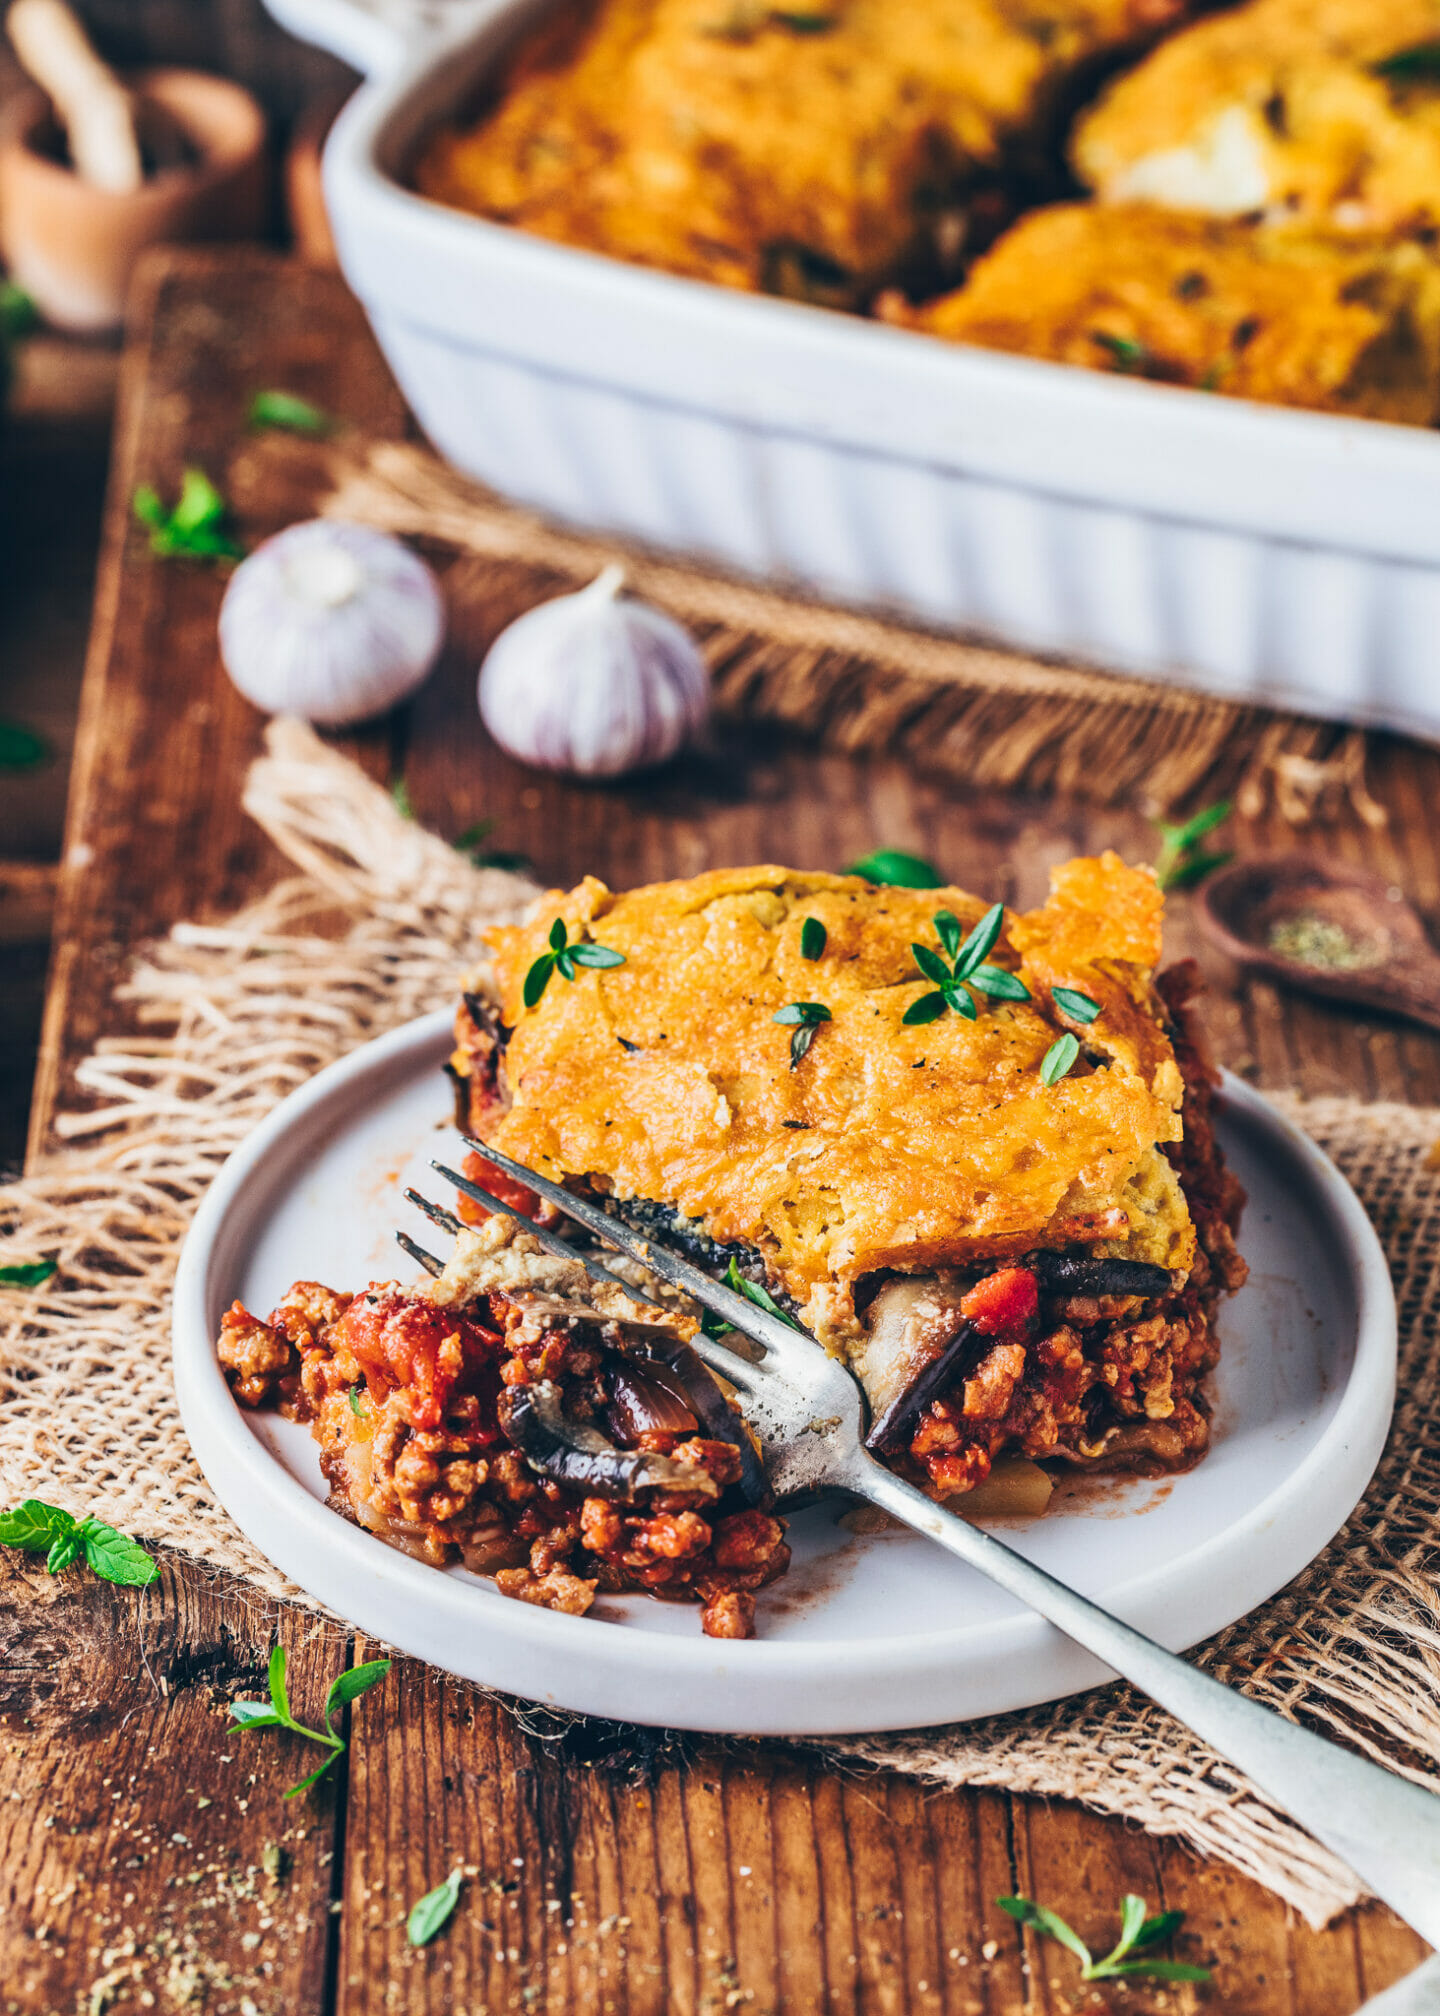 Moussaka with vegan meat tomato sauce and cashew béchamel (Greek lasagna)